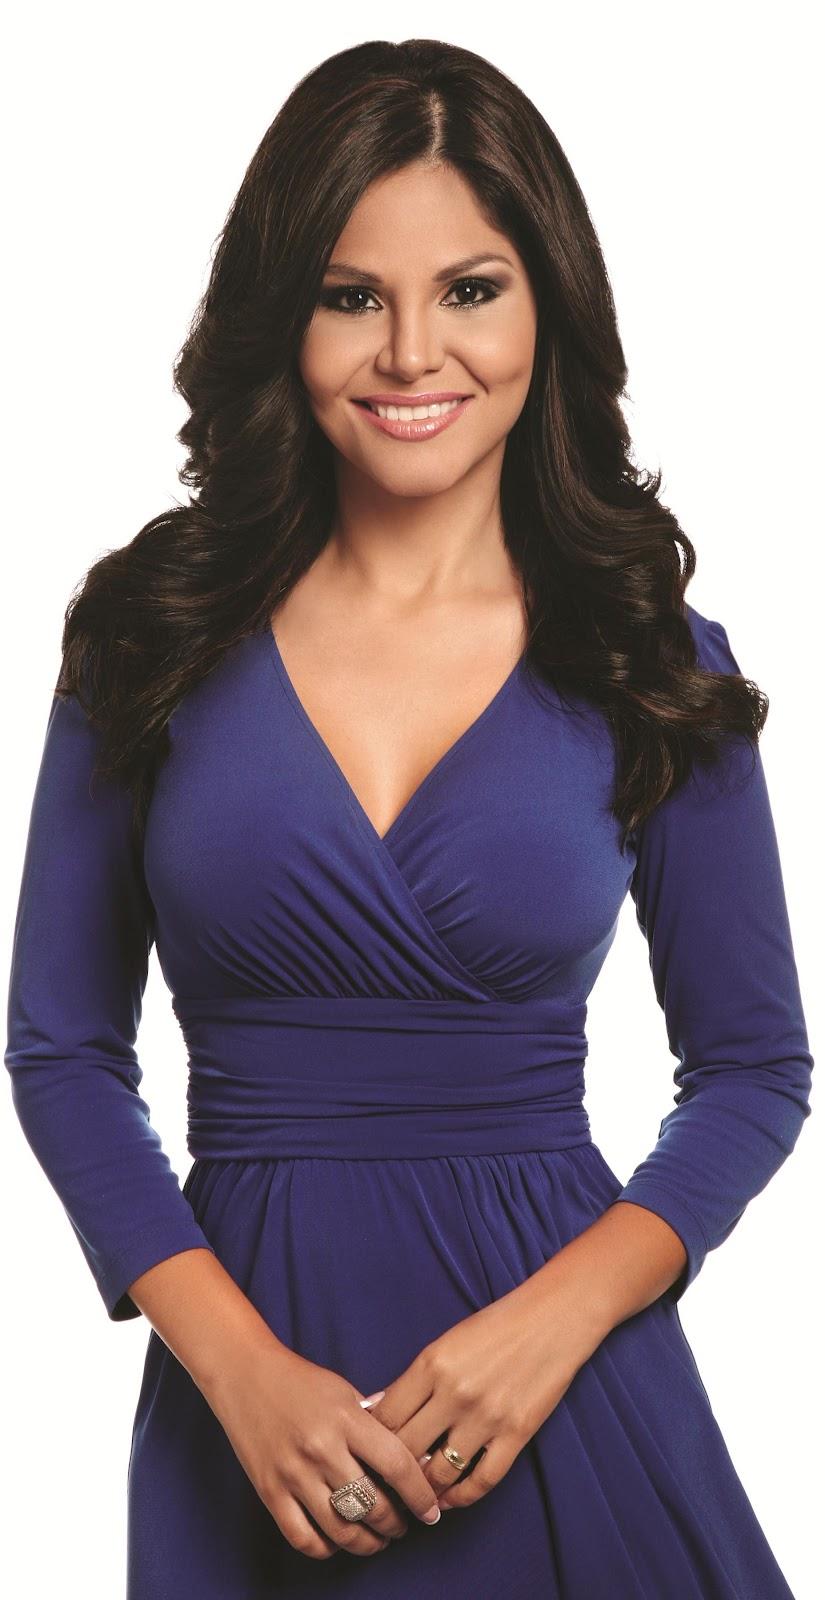 Are latin women news anchors